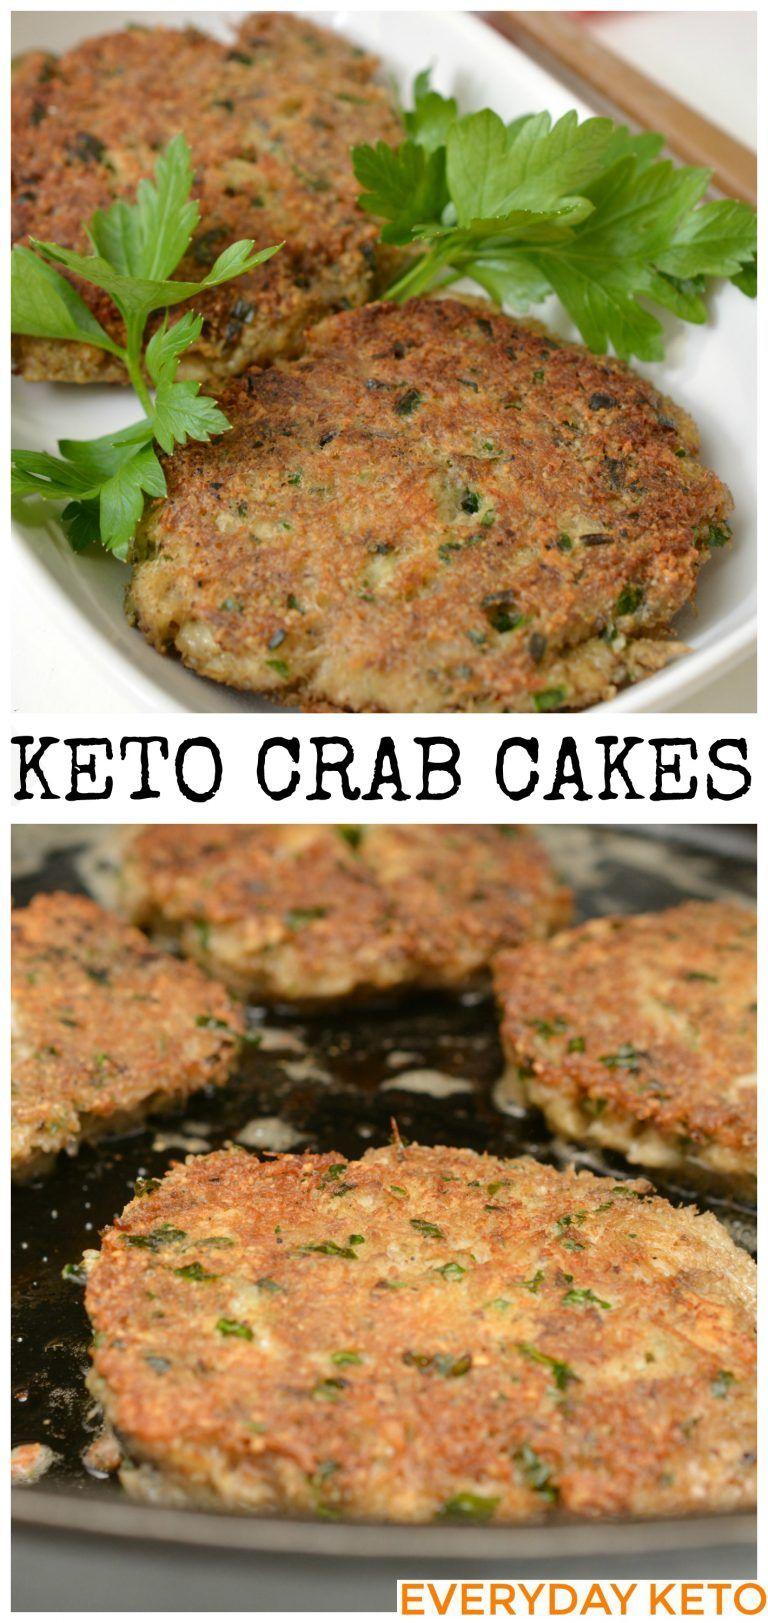 Keto crab cakes recipe healthy superbowl snacks low